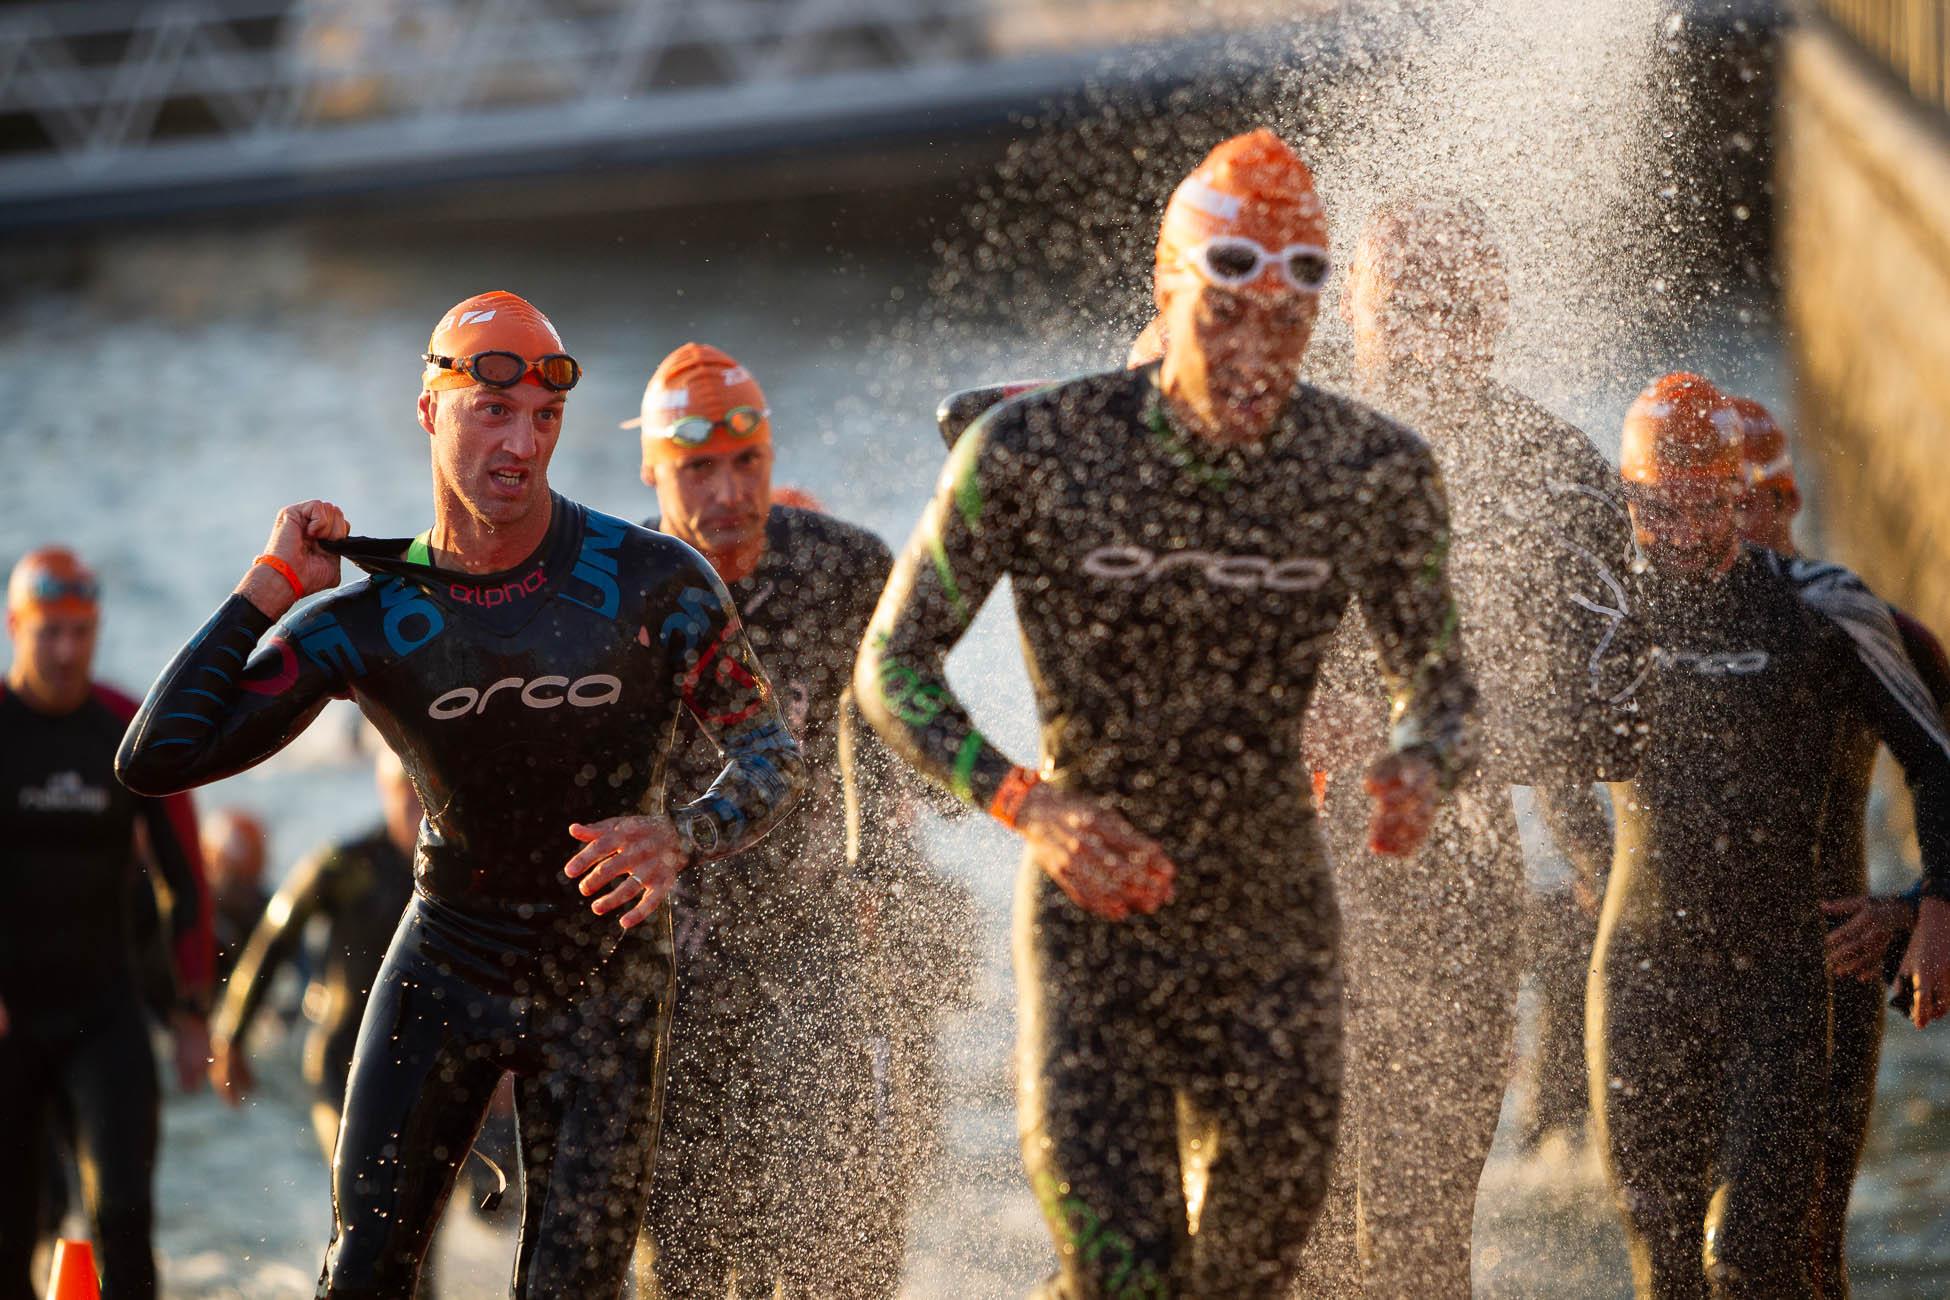 ironman-triathlon-fitness-lifestyle-sport-athlete-photography-010.jpg